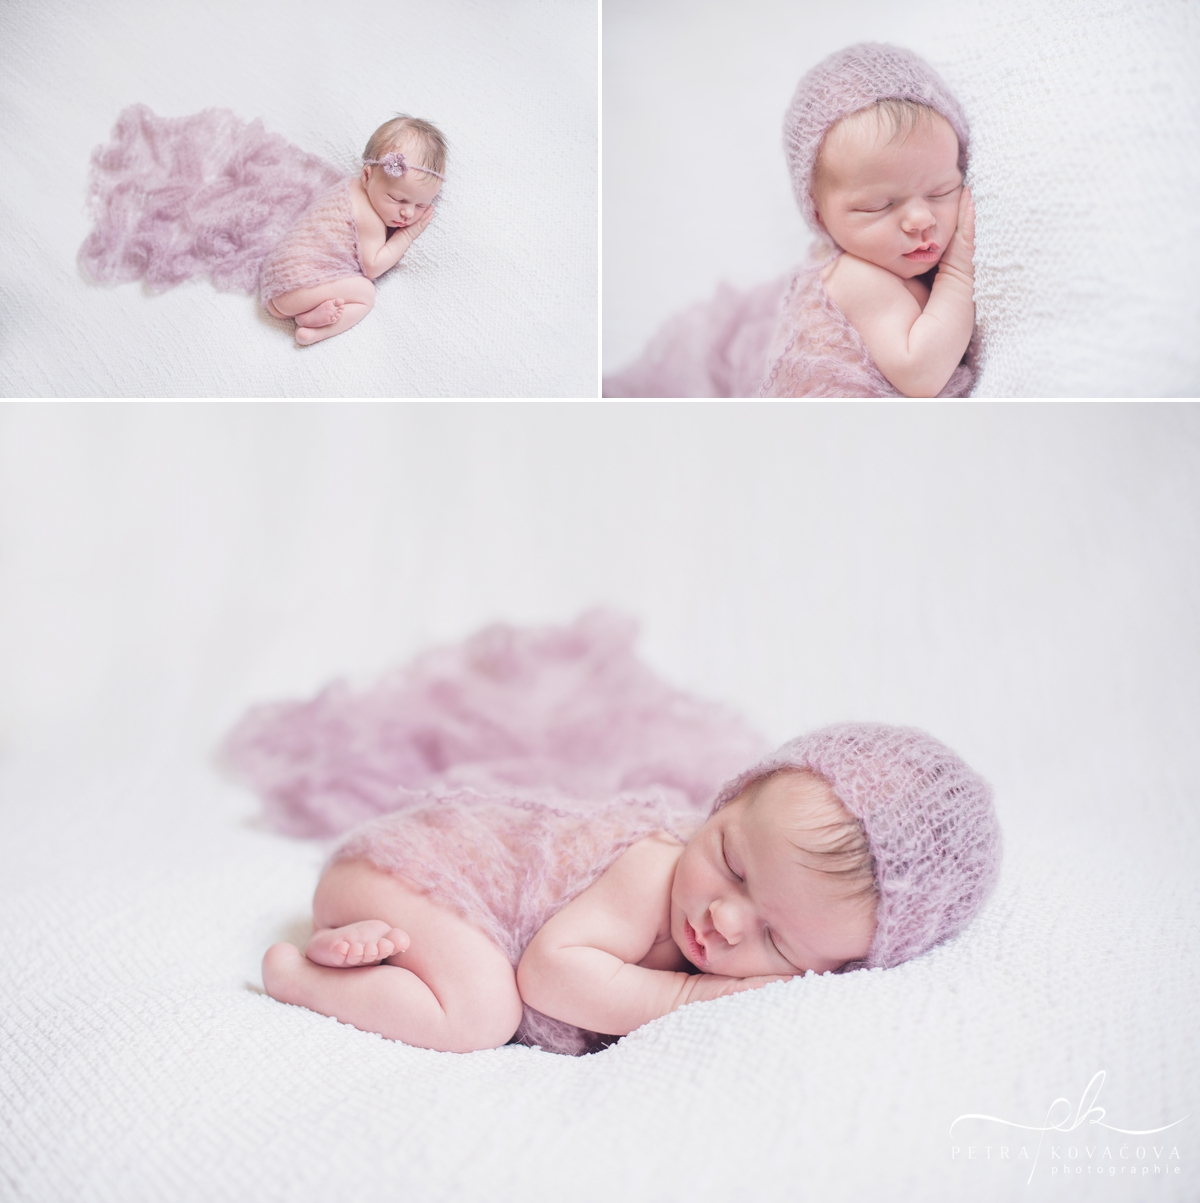 séance-photo-studio-naissance